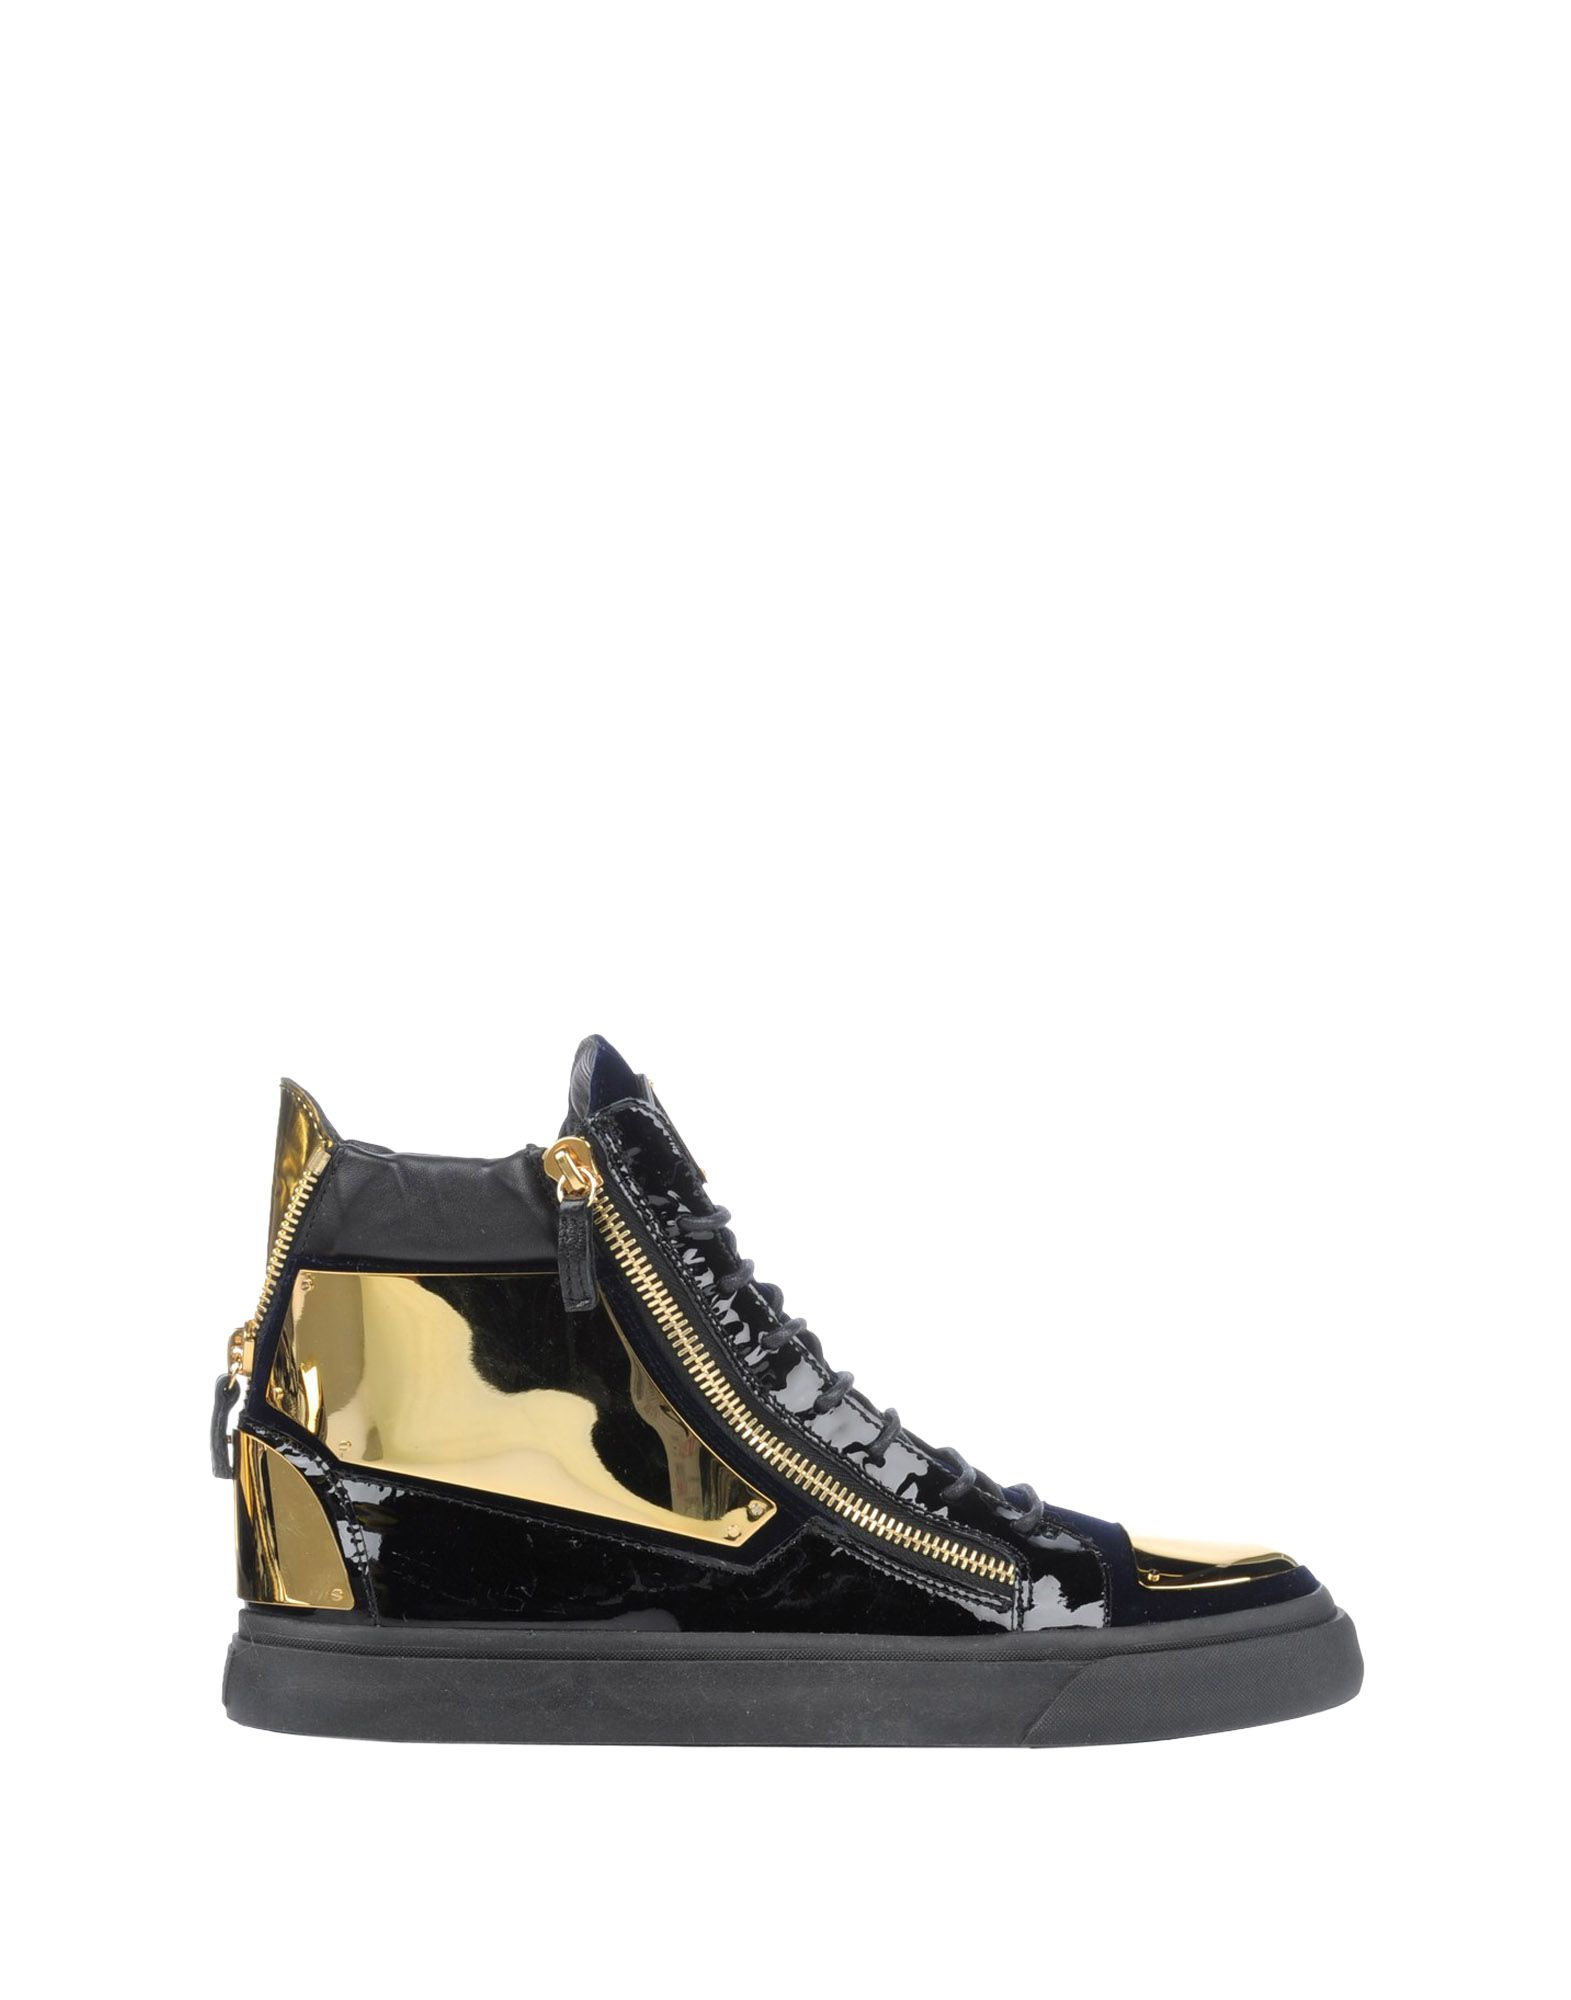 Giuseppe Zanotti Sneakers Herren Qualität  11267568UH Gute Qualität Herren beliebte Schuhe 0799d6